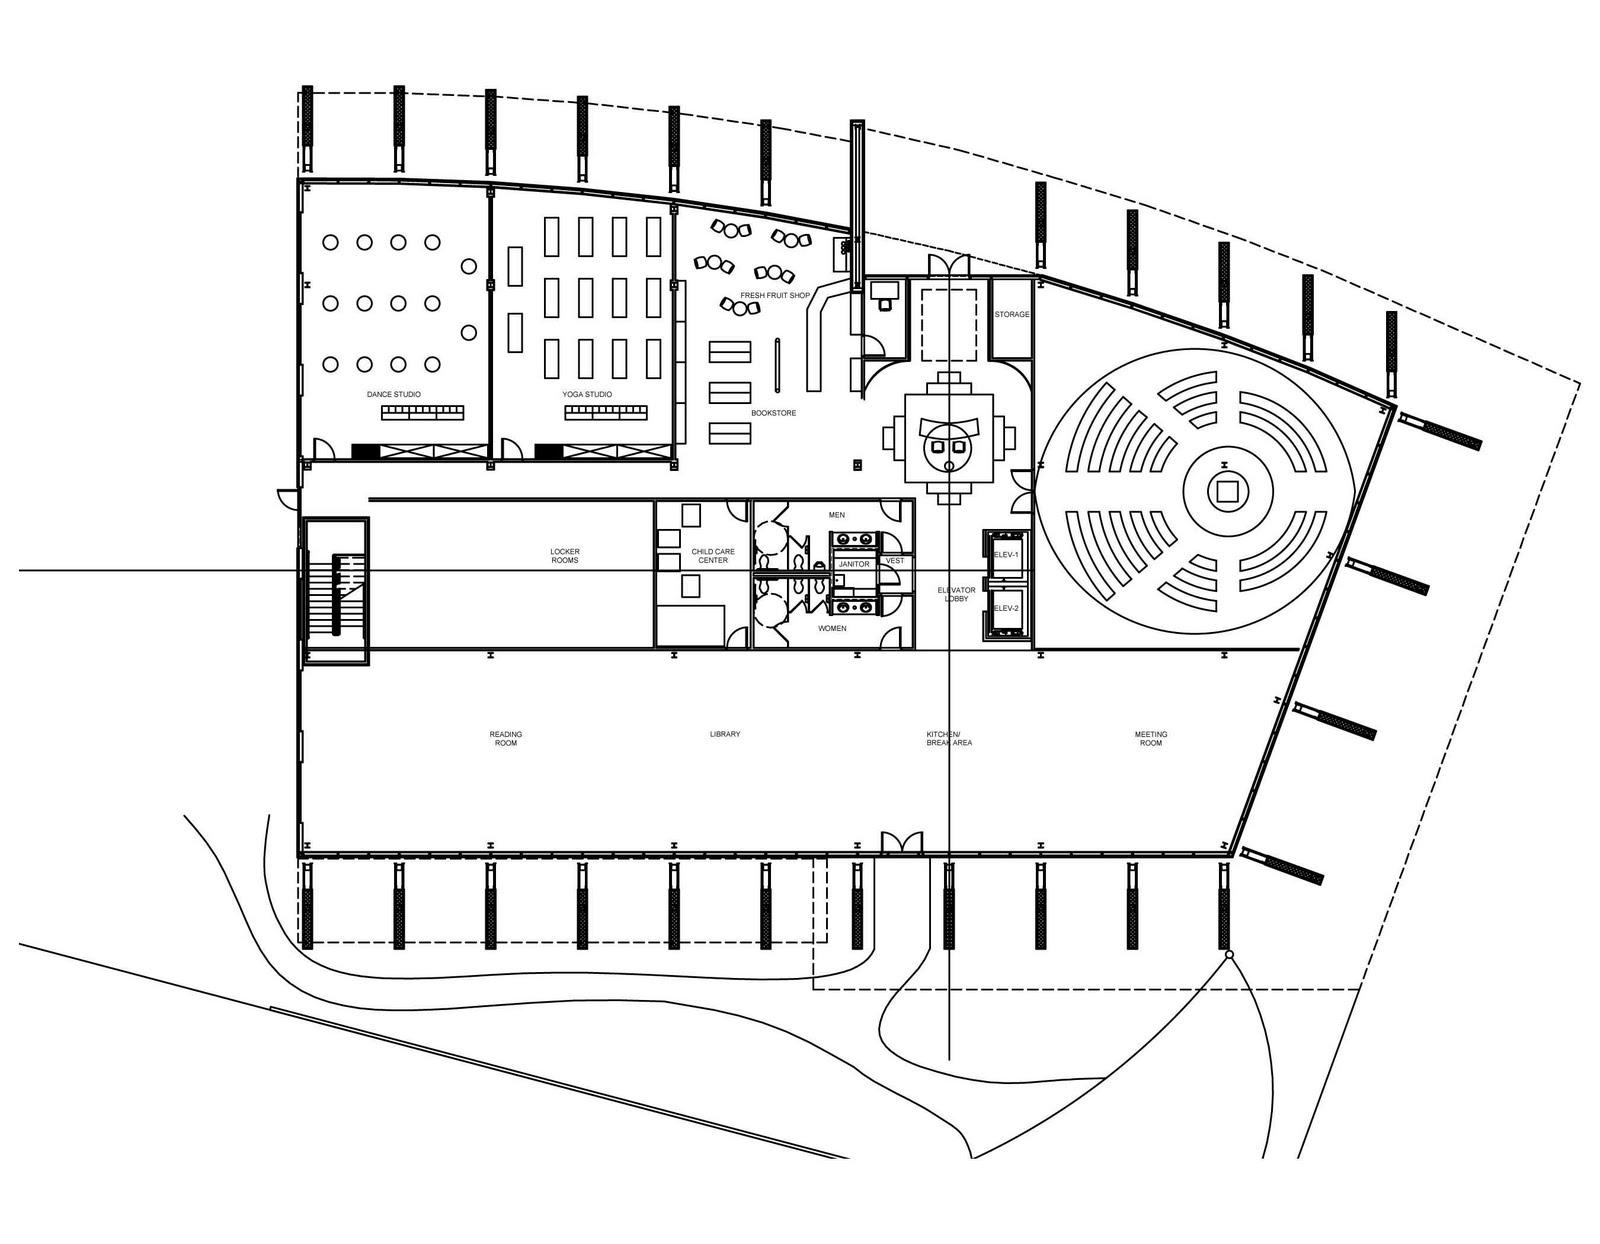 greensphere wellness center  preliminary floor plan